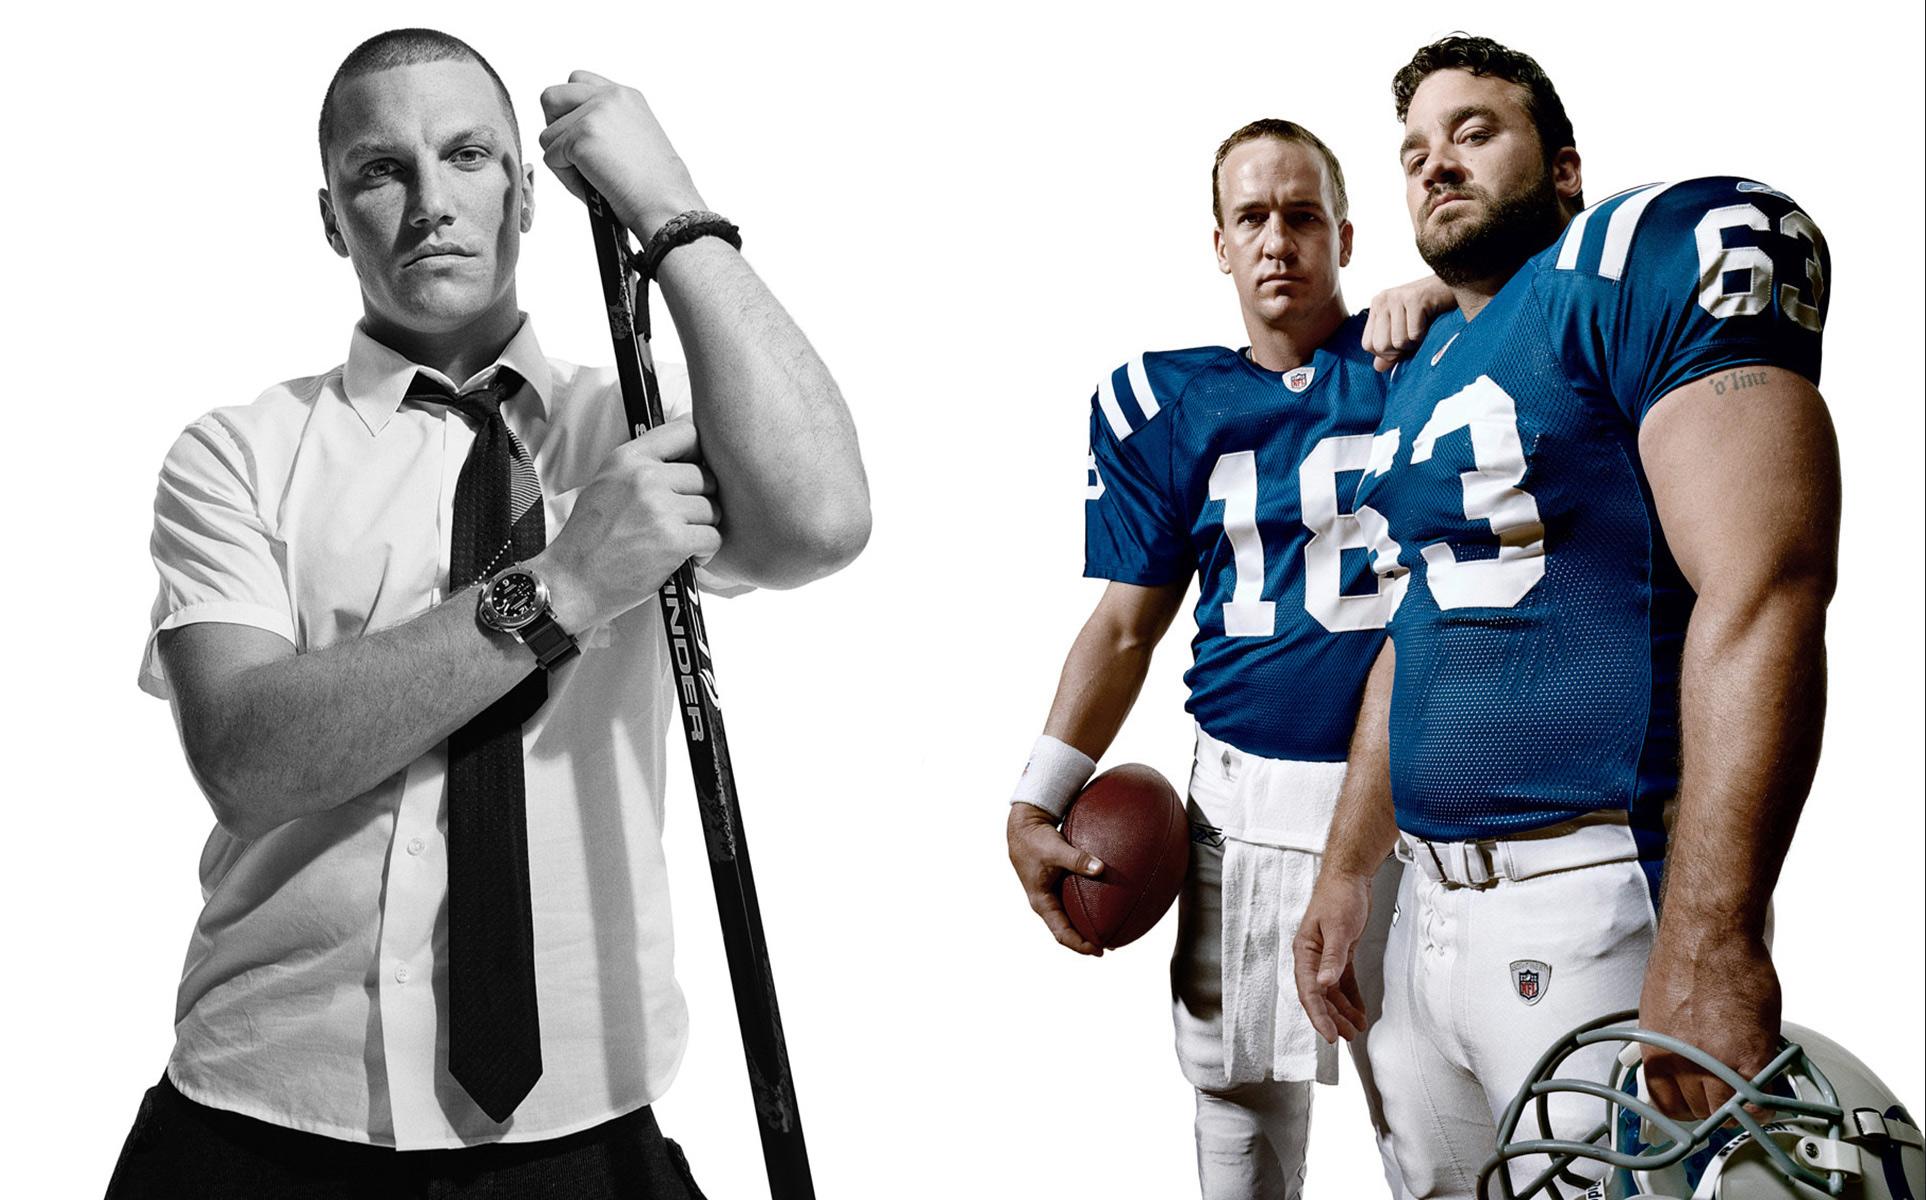 PR_ESPN_AVERY-Manning_sq.jpg